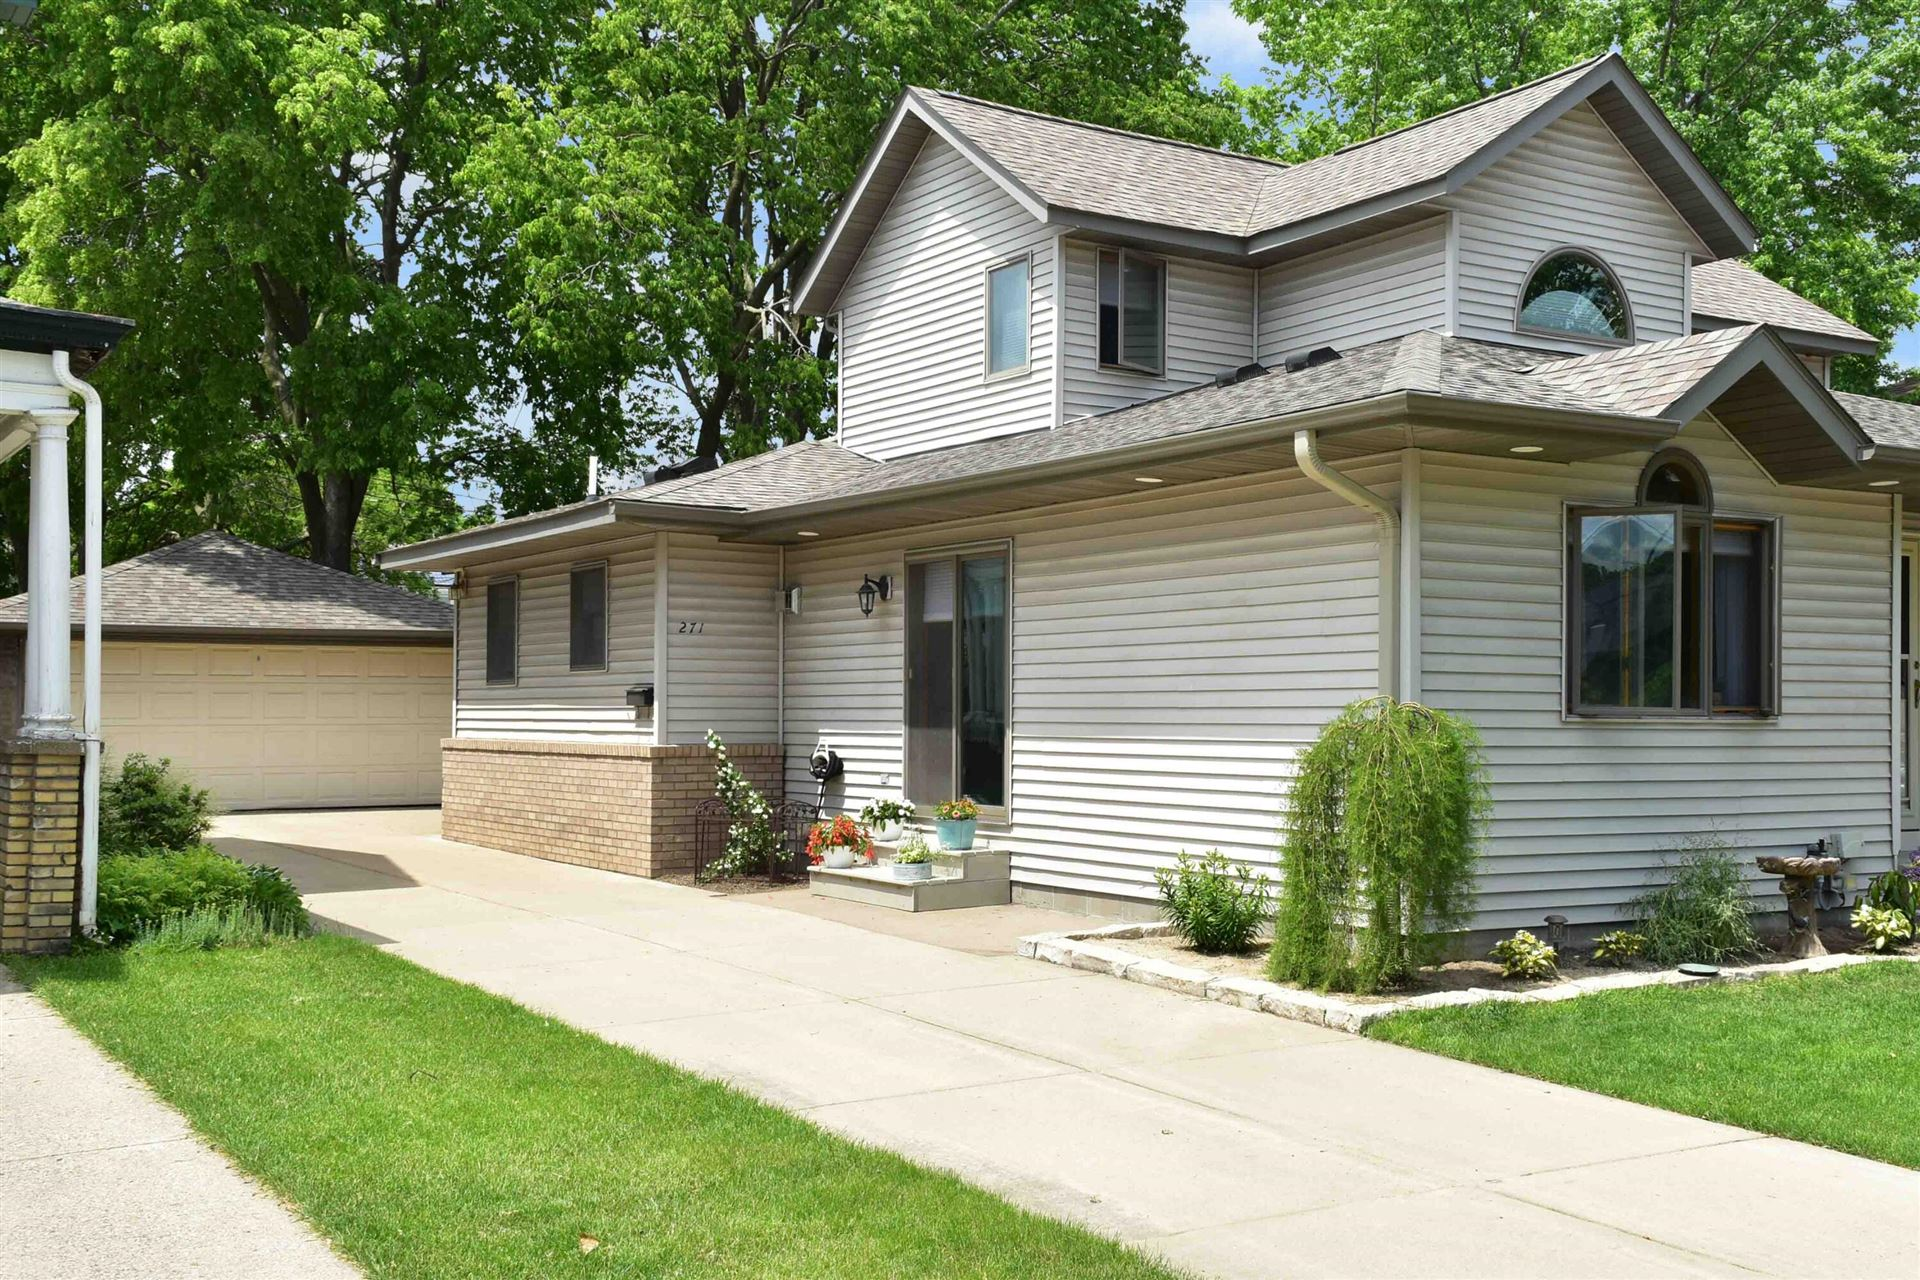 271 Wilson St, Winona, MN 55987 - MLS#: 1729346